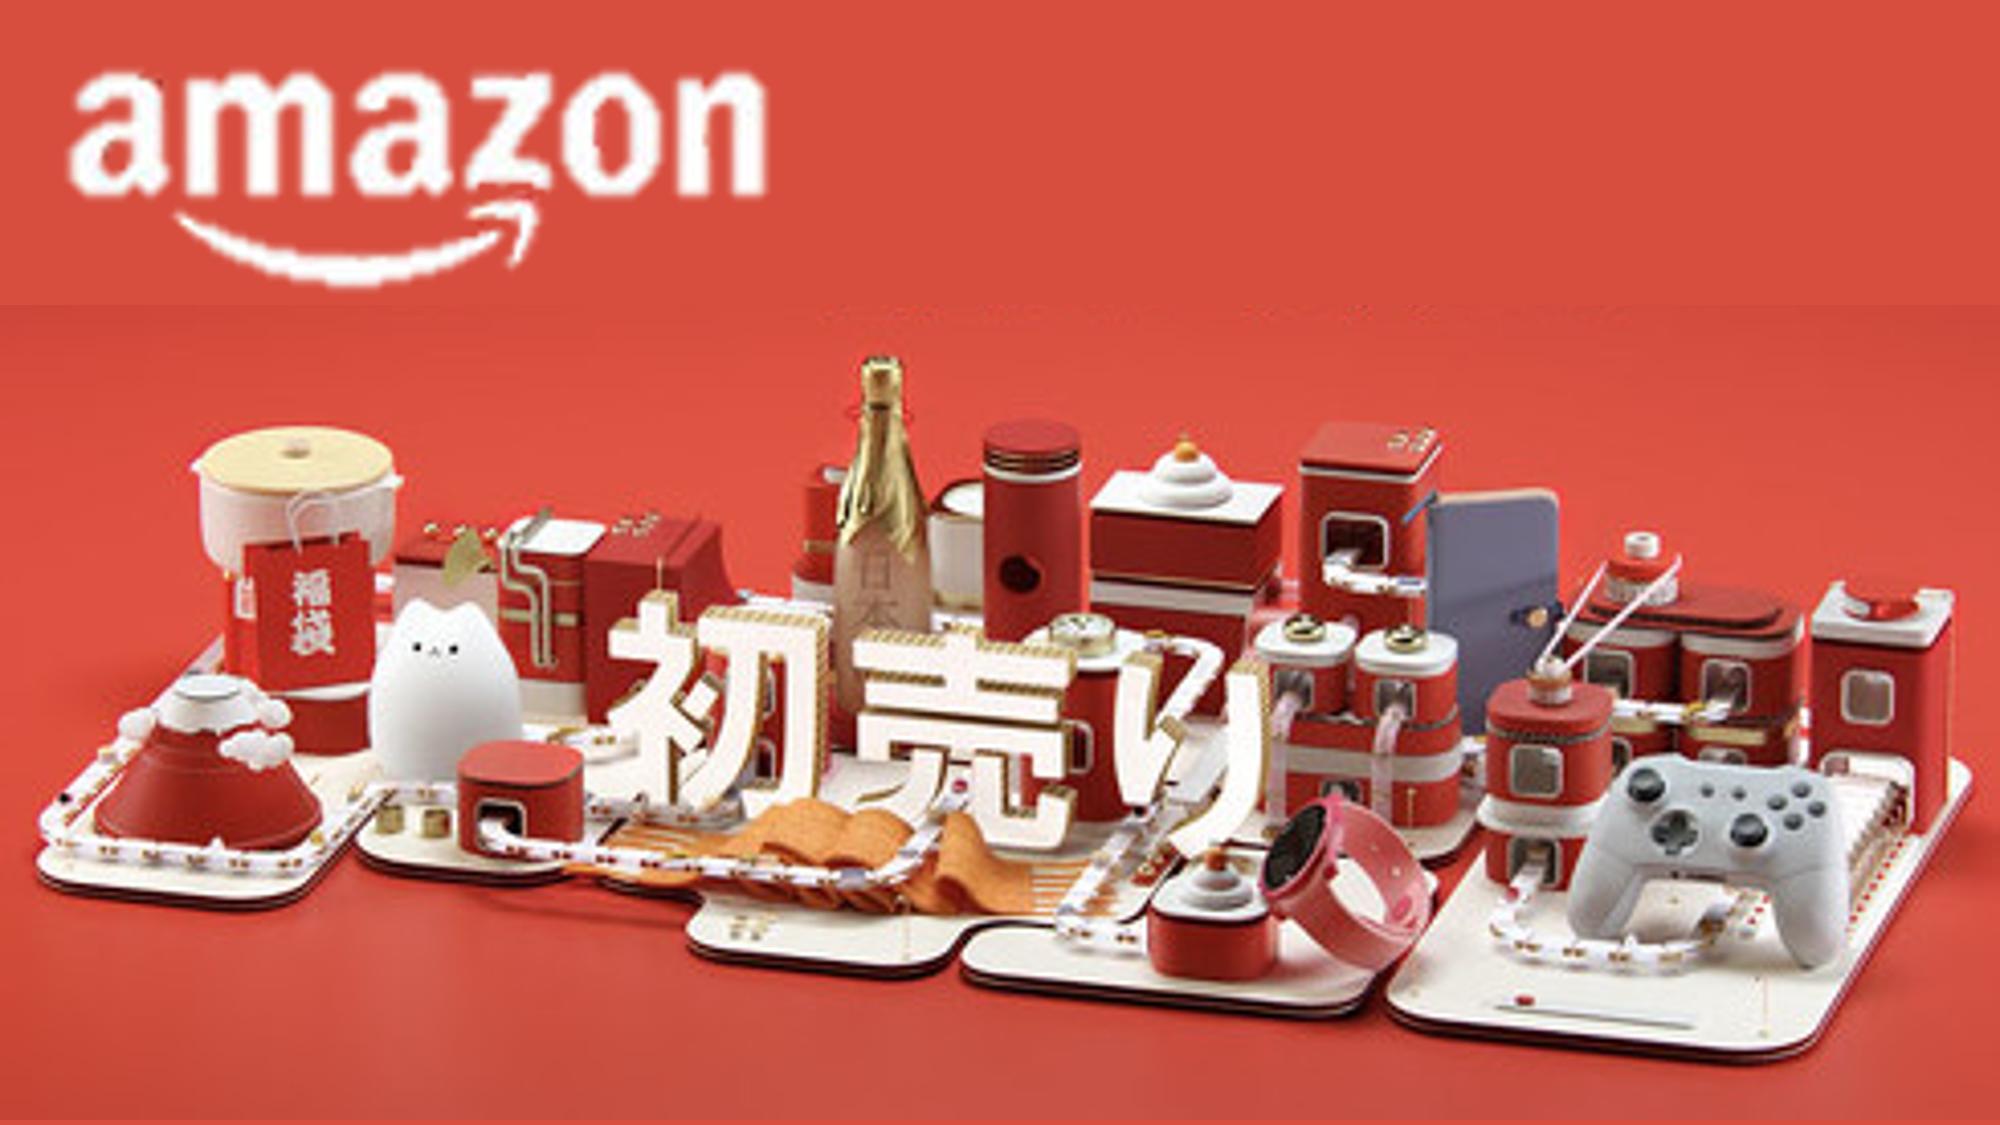 【Amazon初売りセール】2022年次回はいつ?新年初売りはコレで攻略!福袋などのおすすめセール対象品までたっぷり紹介